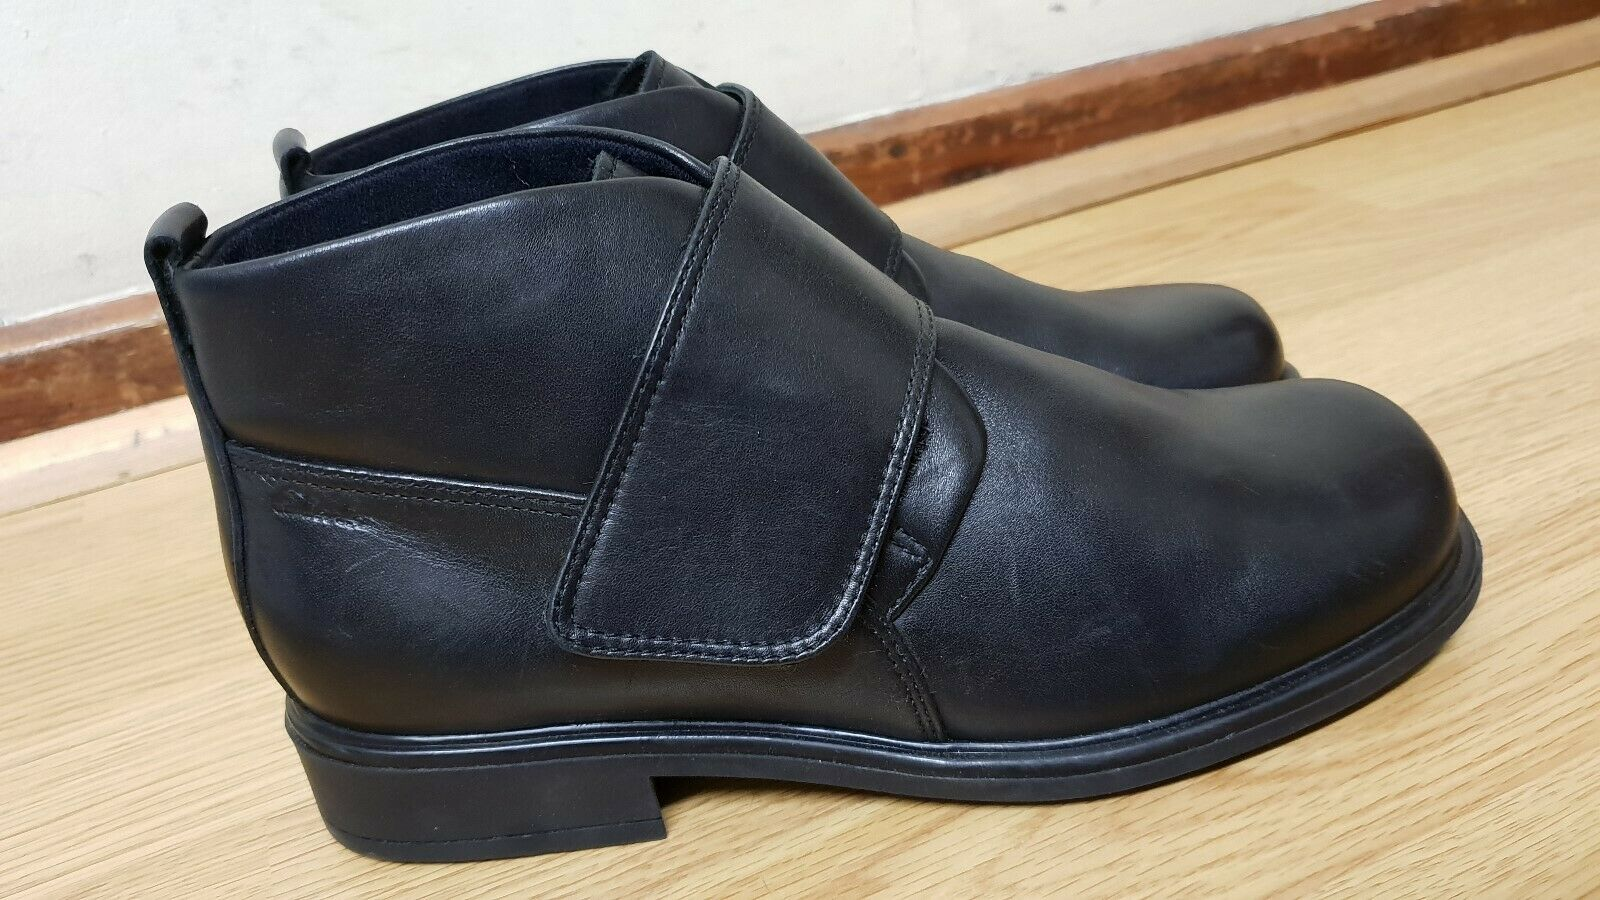 CLARKS WOMEN BLACK BOOTS SIZE UK 4.5   EU 37.5